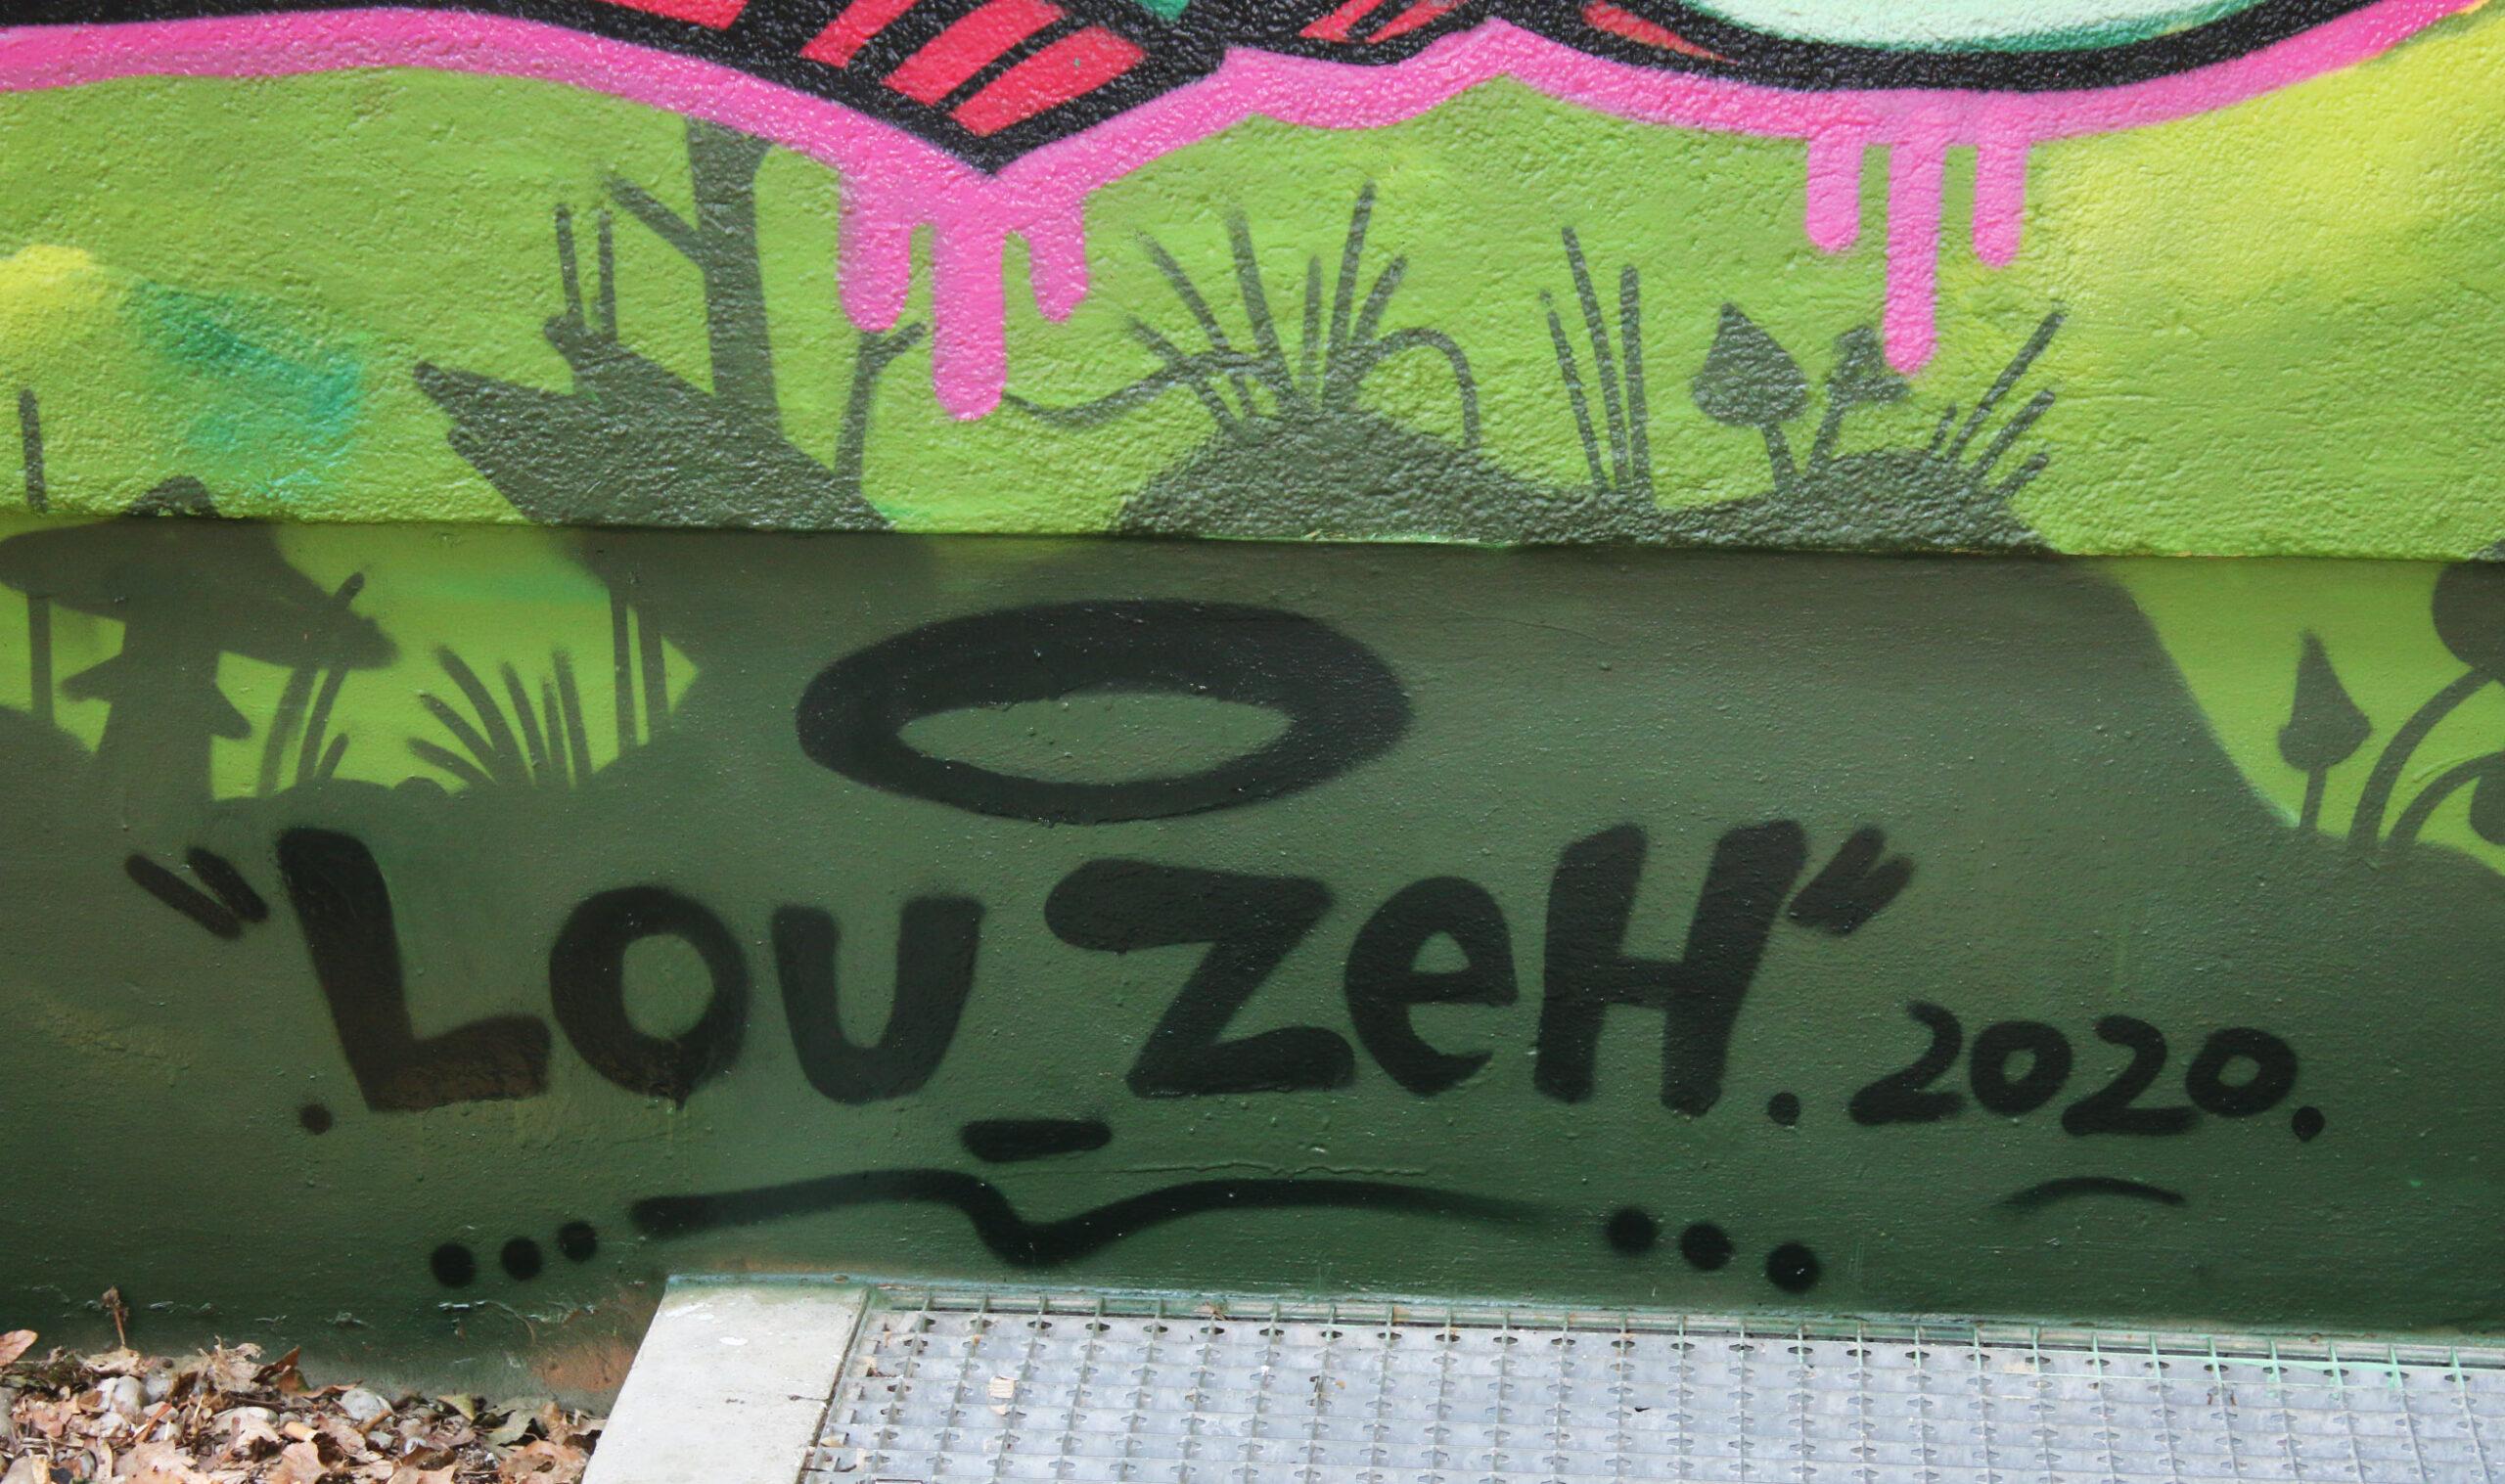 lou zeh louzeh graffiti hochfeld augsburg